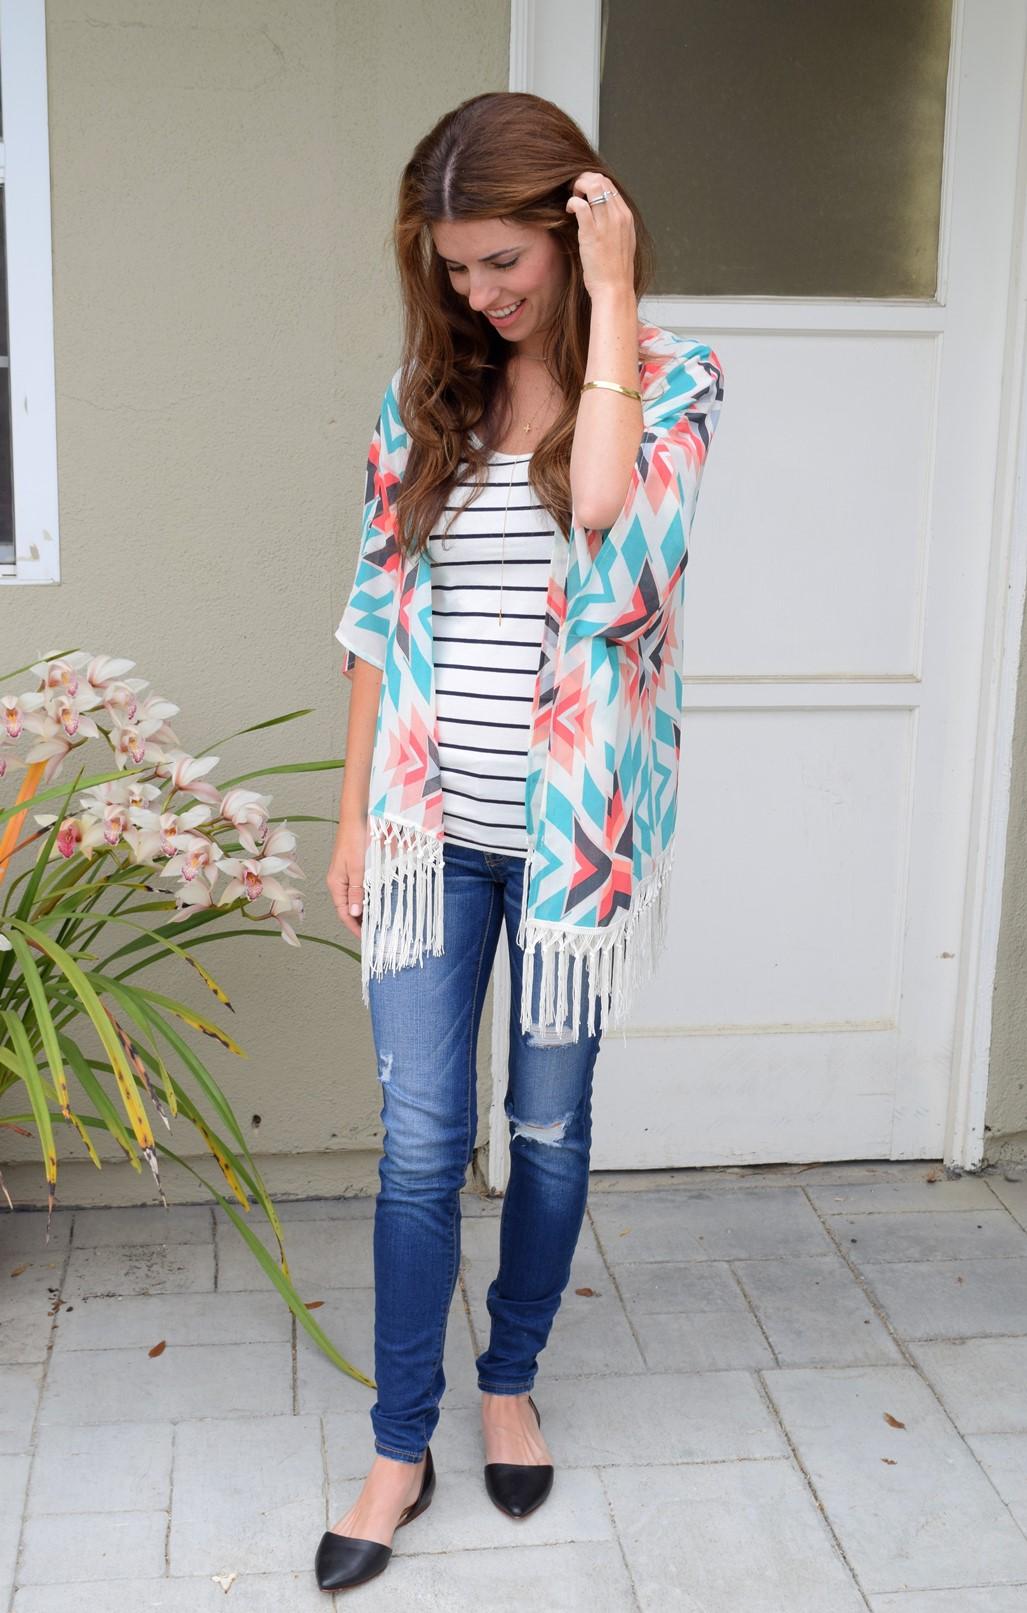 1. Wear of the Week Kimono + Stripes